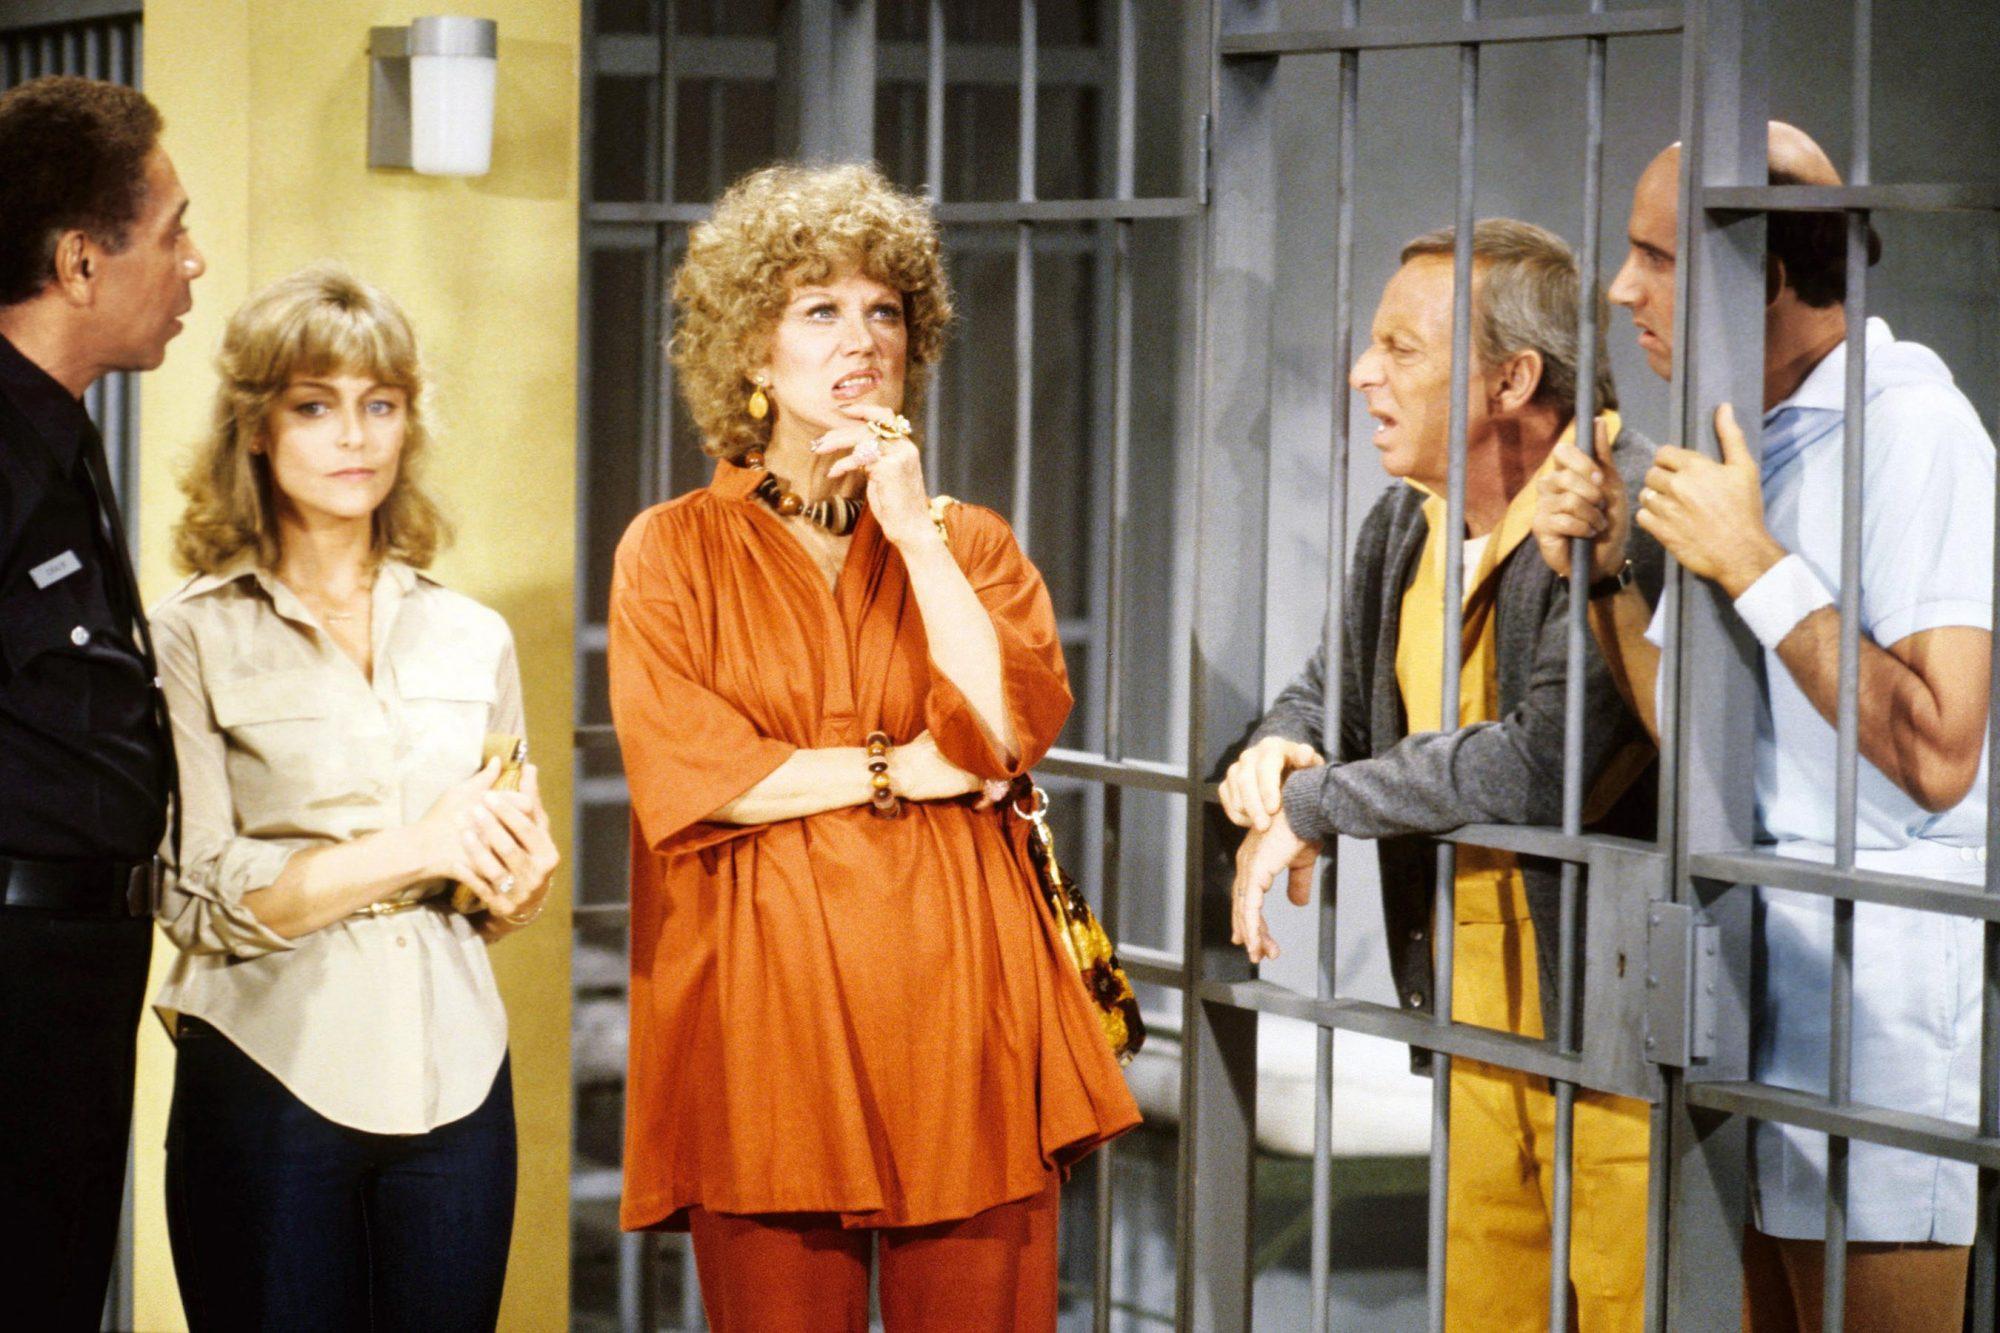 THE ROPERS, l-r: Patricia McCormack, Audra Lindley, Norman Fell, Jeffrey Tambor, 1979-80